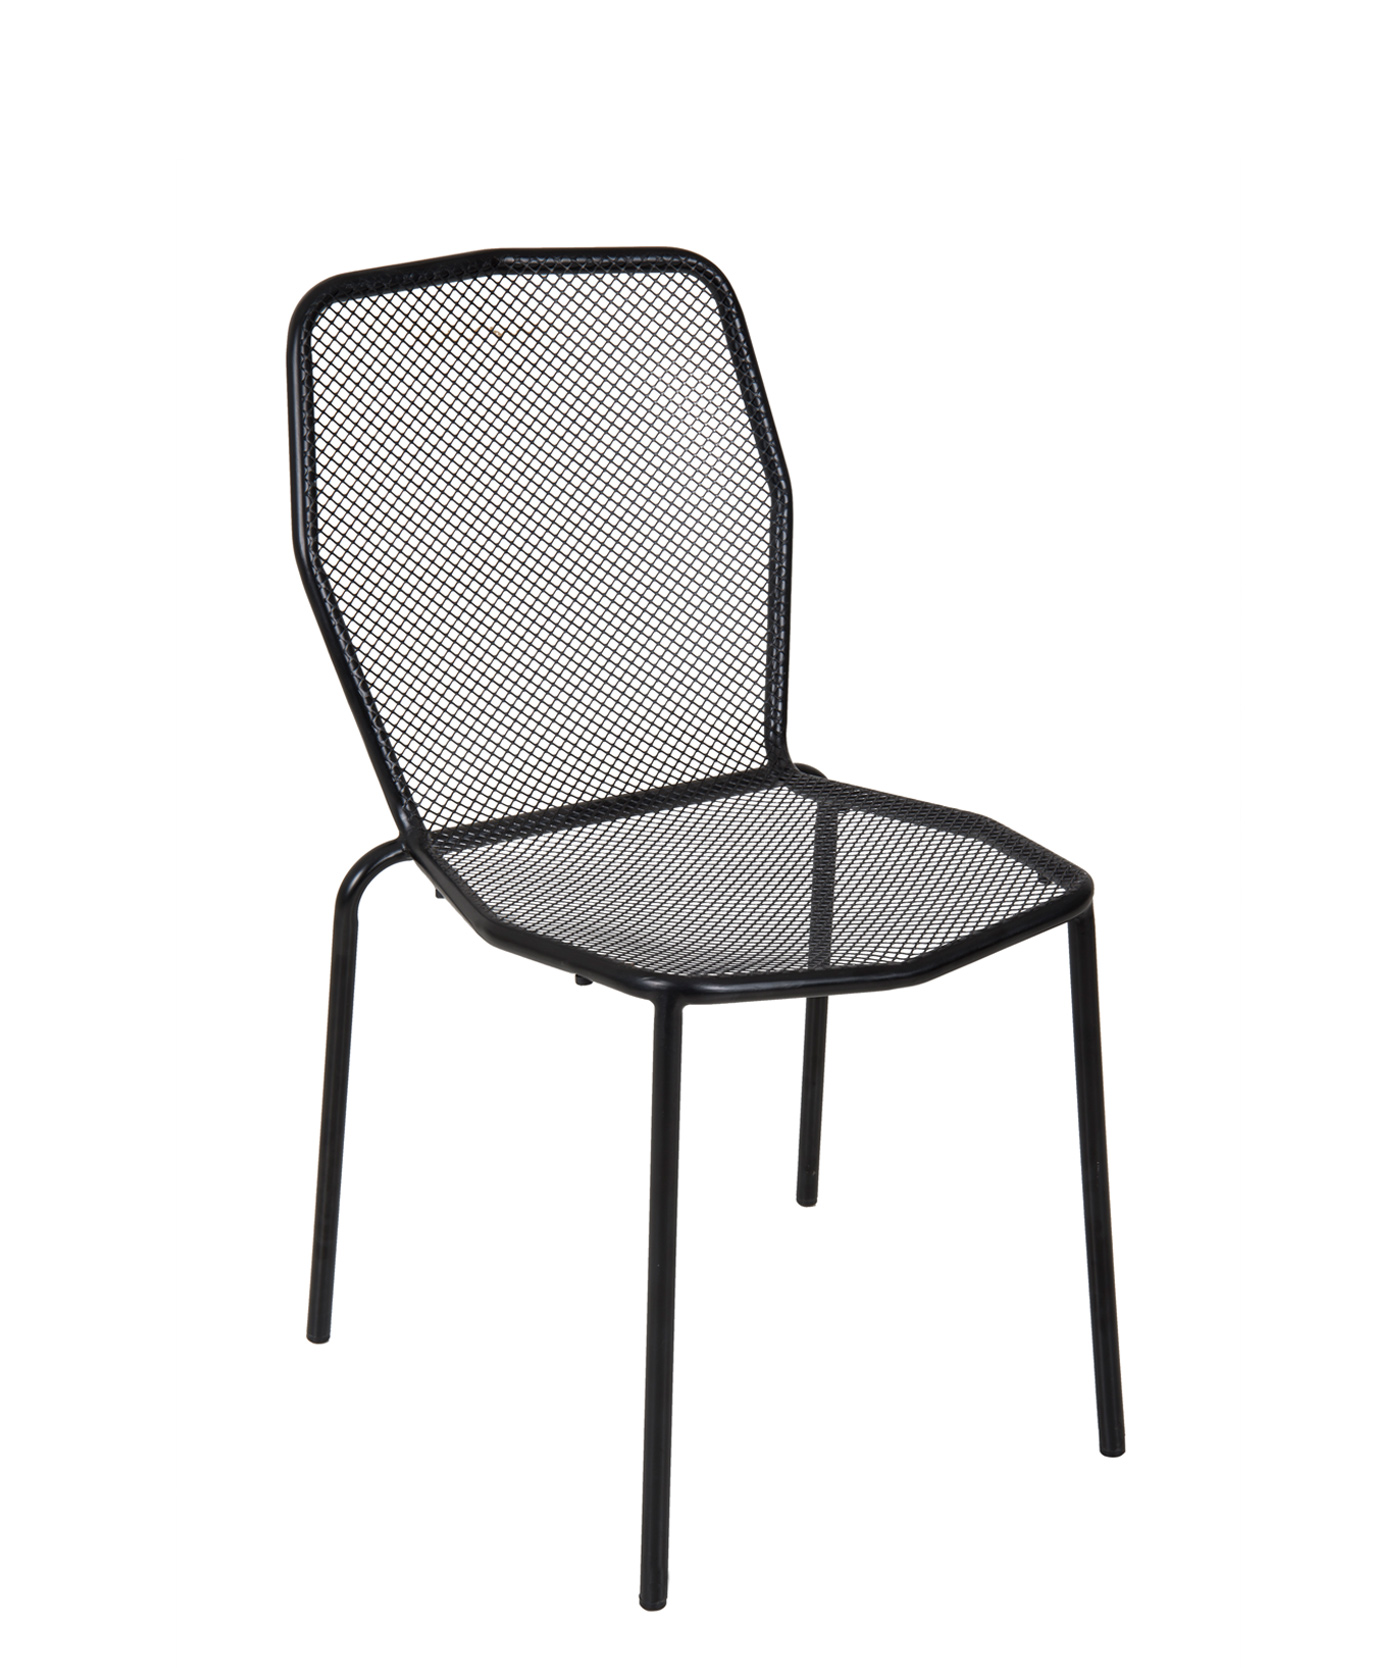 steel chair suppliers rent ghost chairs metal millennium seating usa restaurant